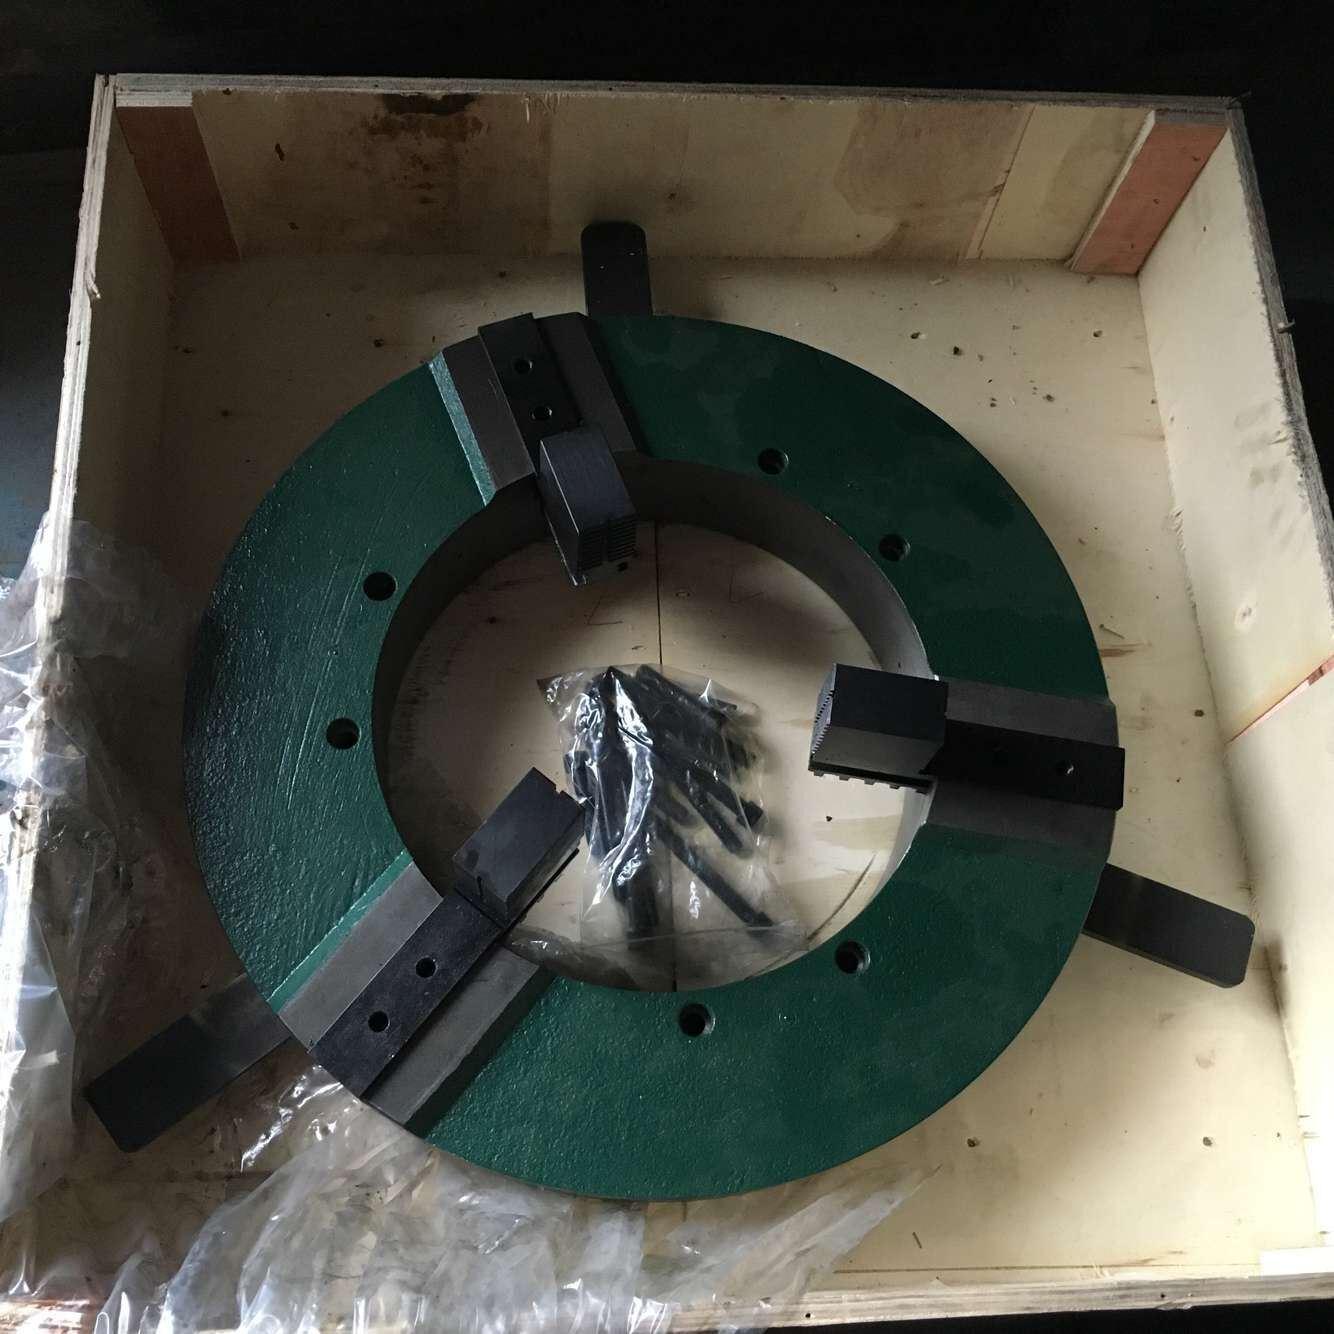 Digital Display Light Duty Welding Positioner for Flange Welding.